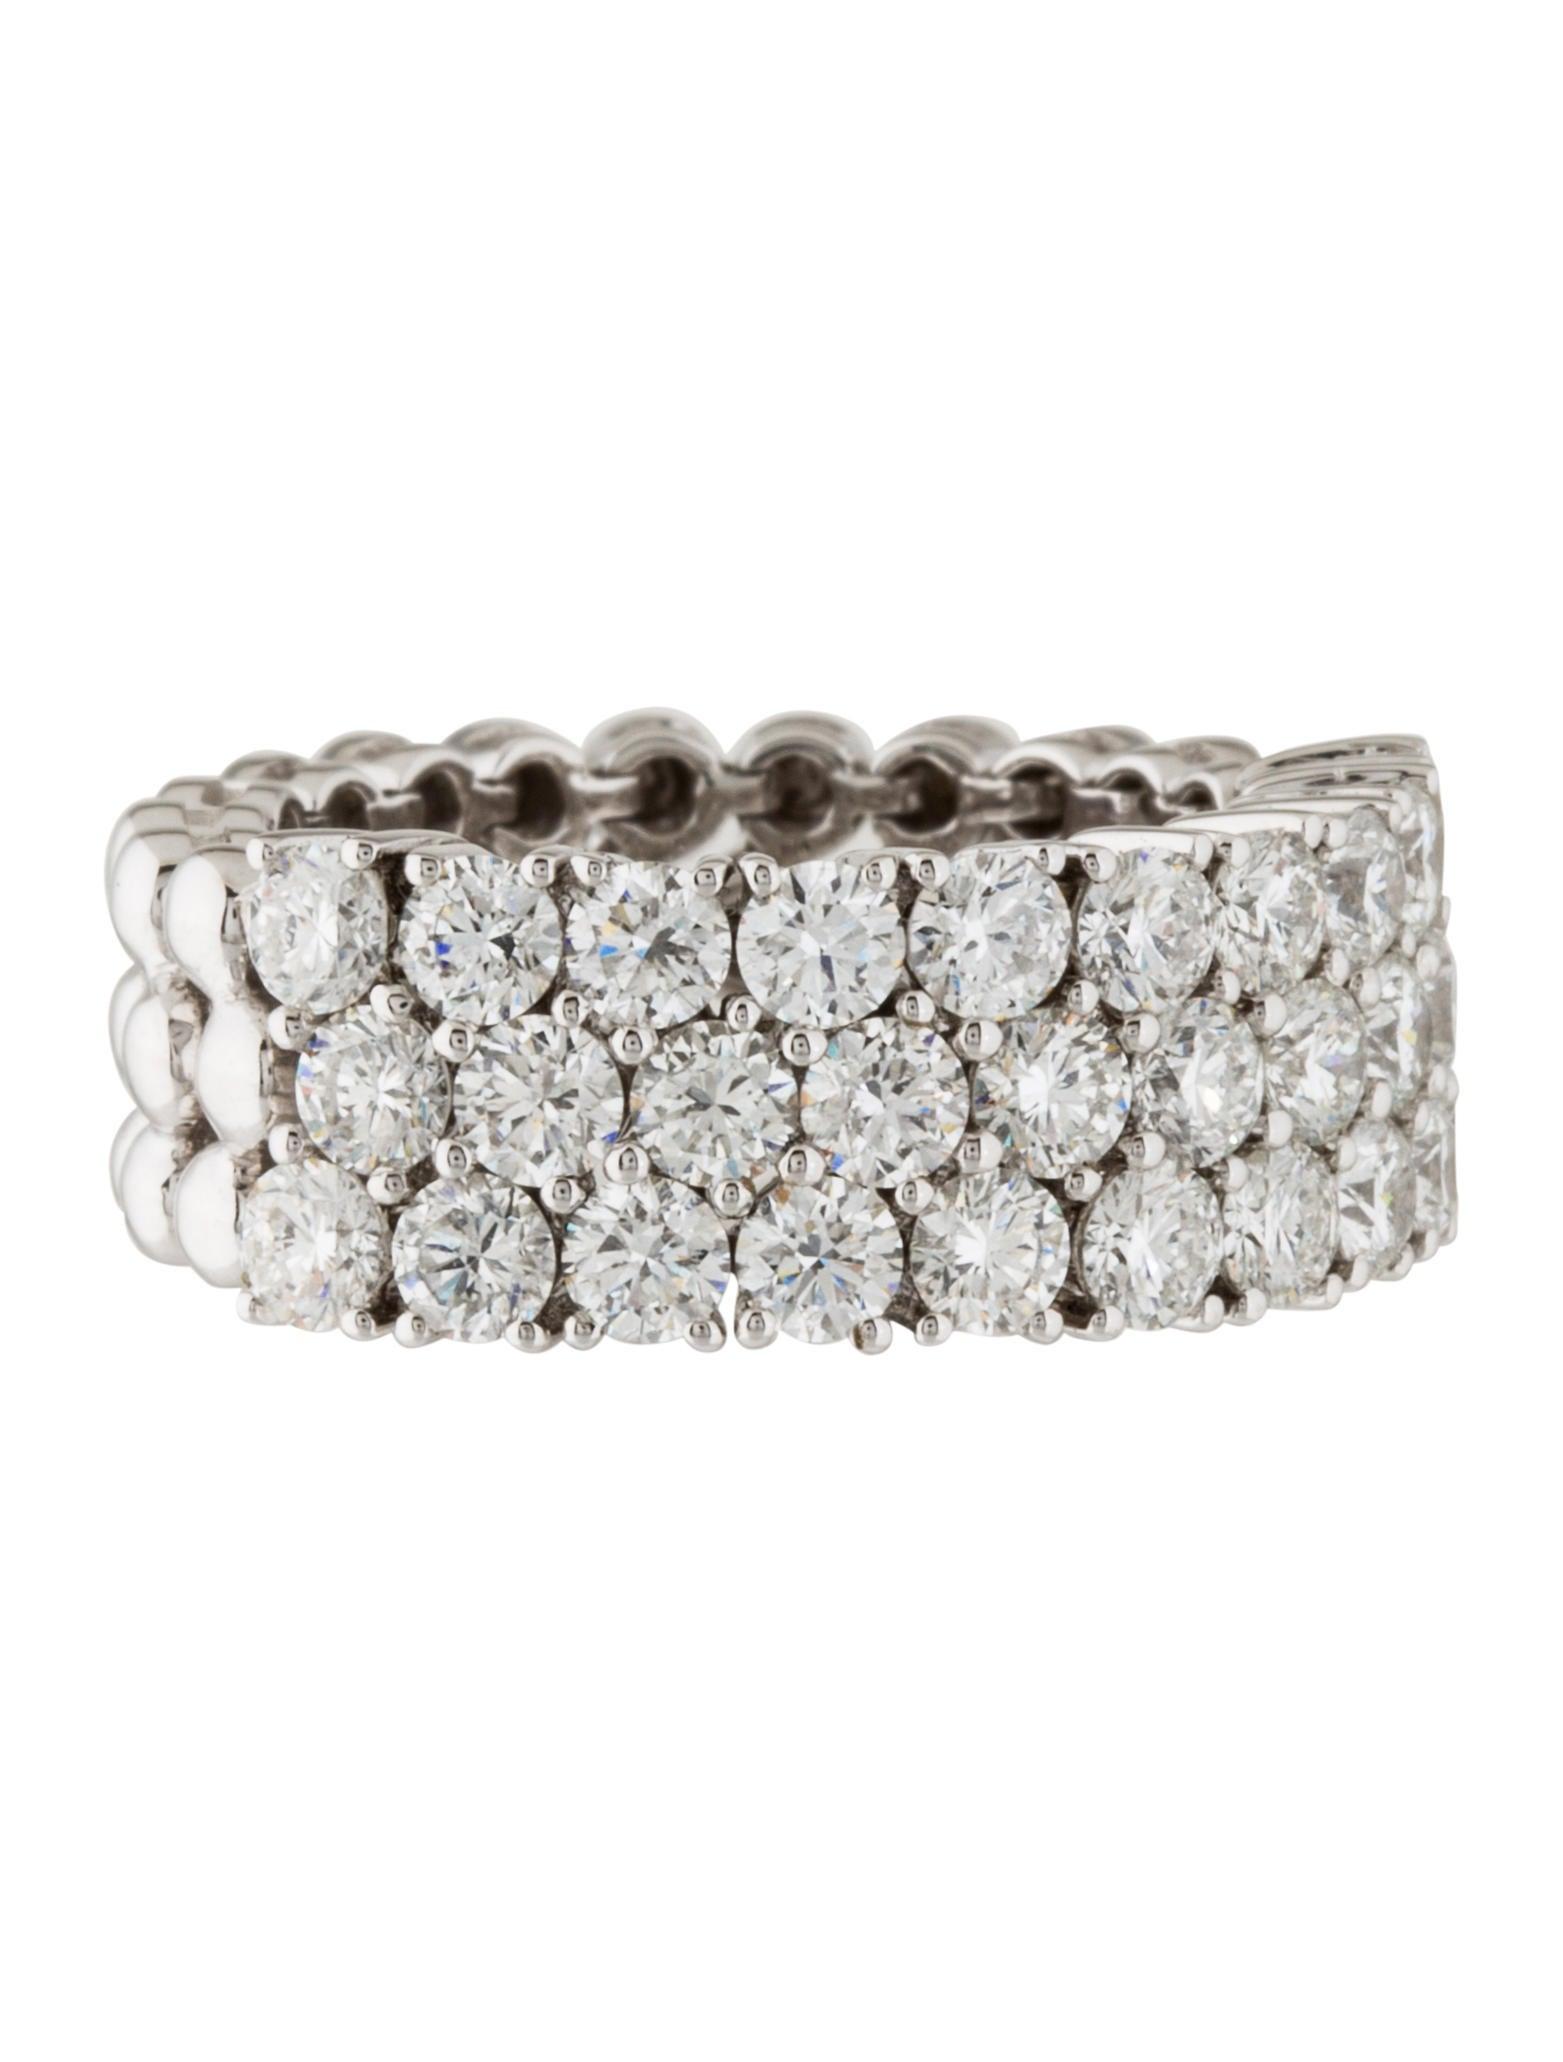 Sonia B 14K Flexible Diamond Ring Rings SOB